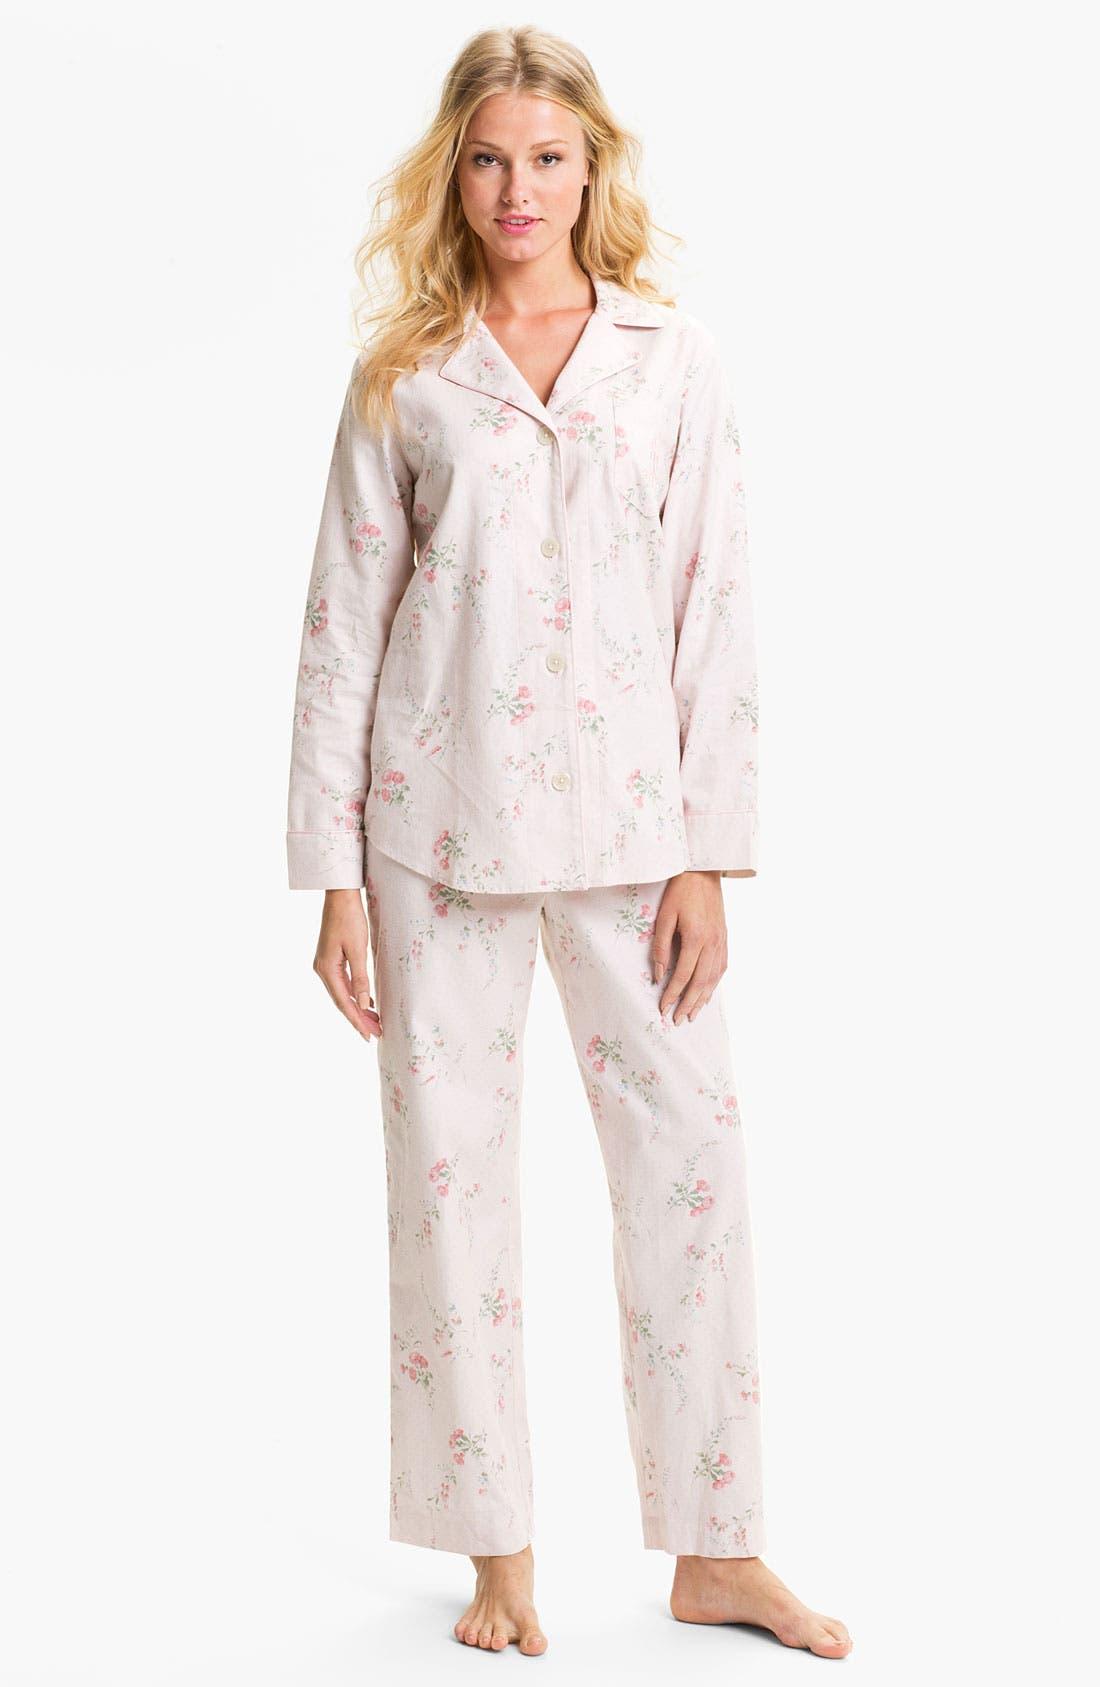 Main Image - Lauren Ralph Lauren Sleepwear Pattern Brushed Twill Pajamas